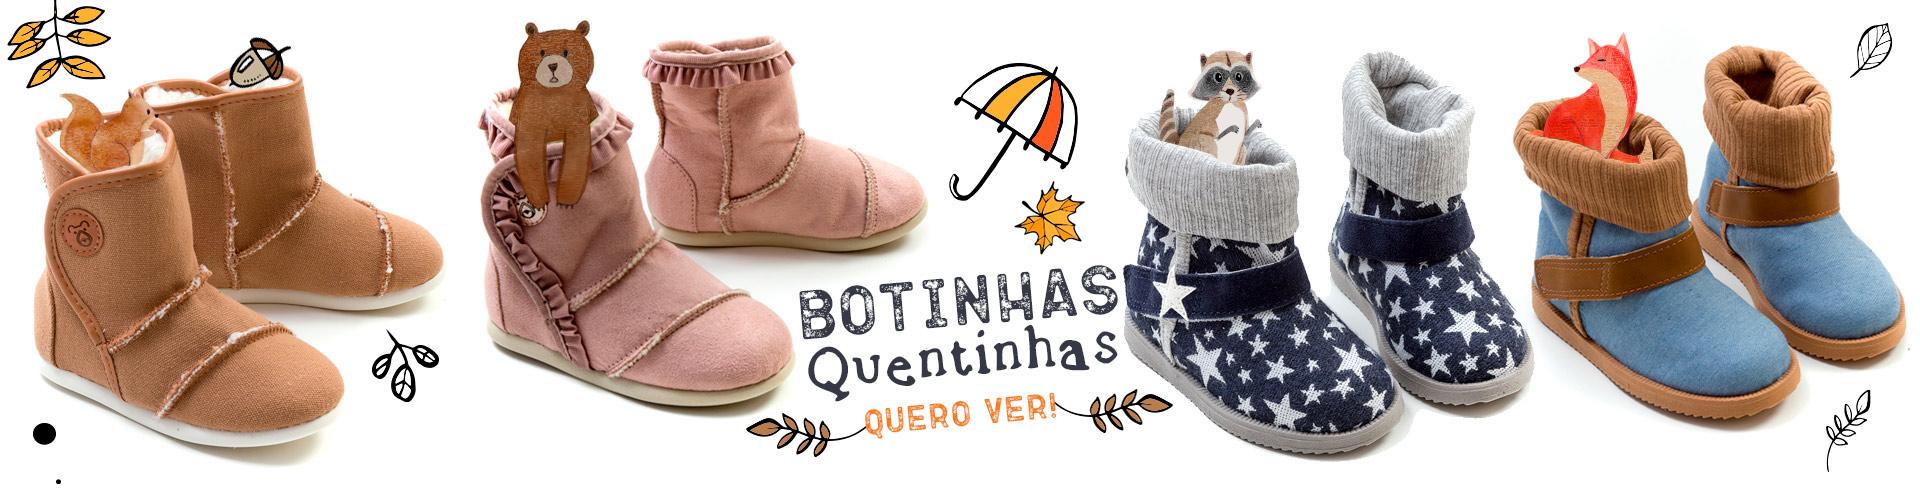 Banner Botinhas